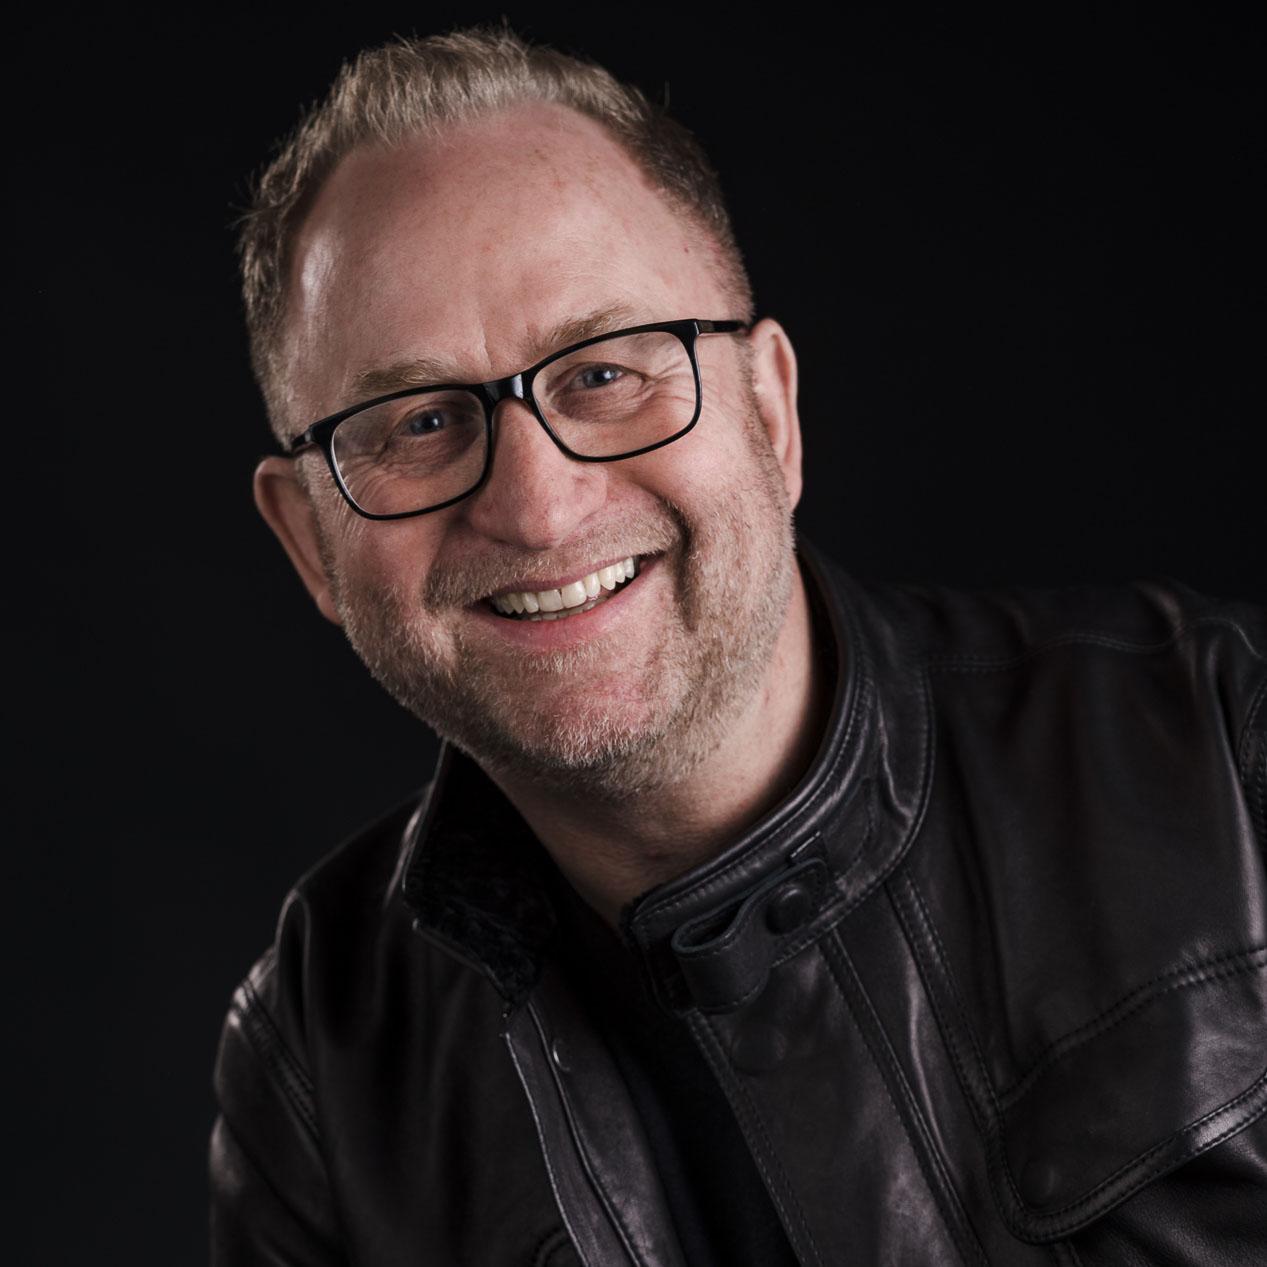 Michael Radtke